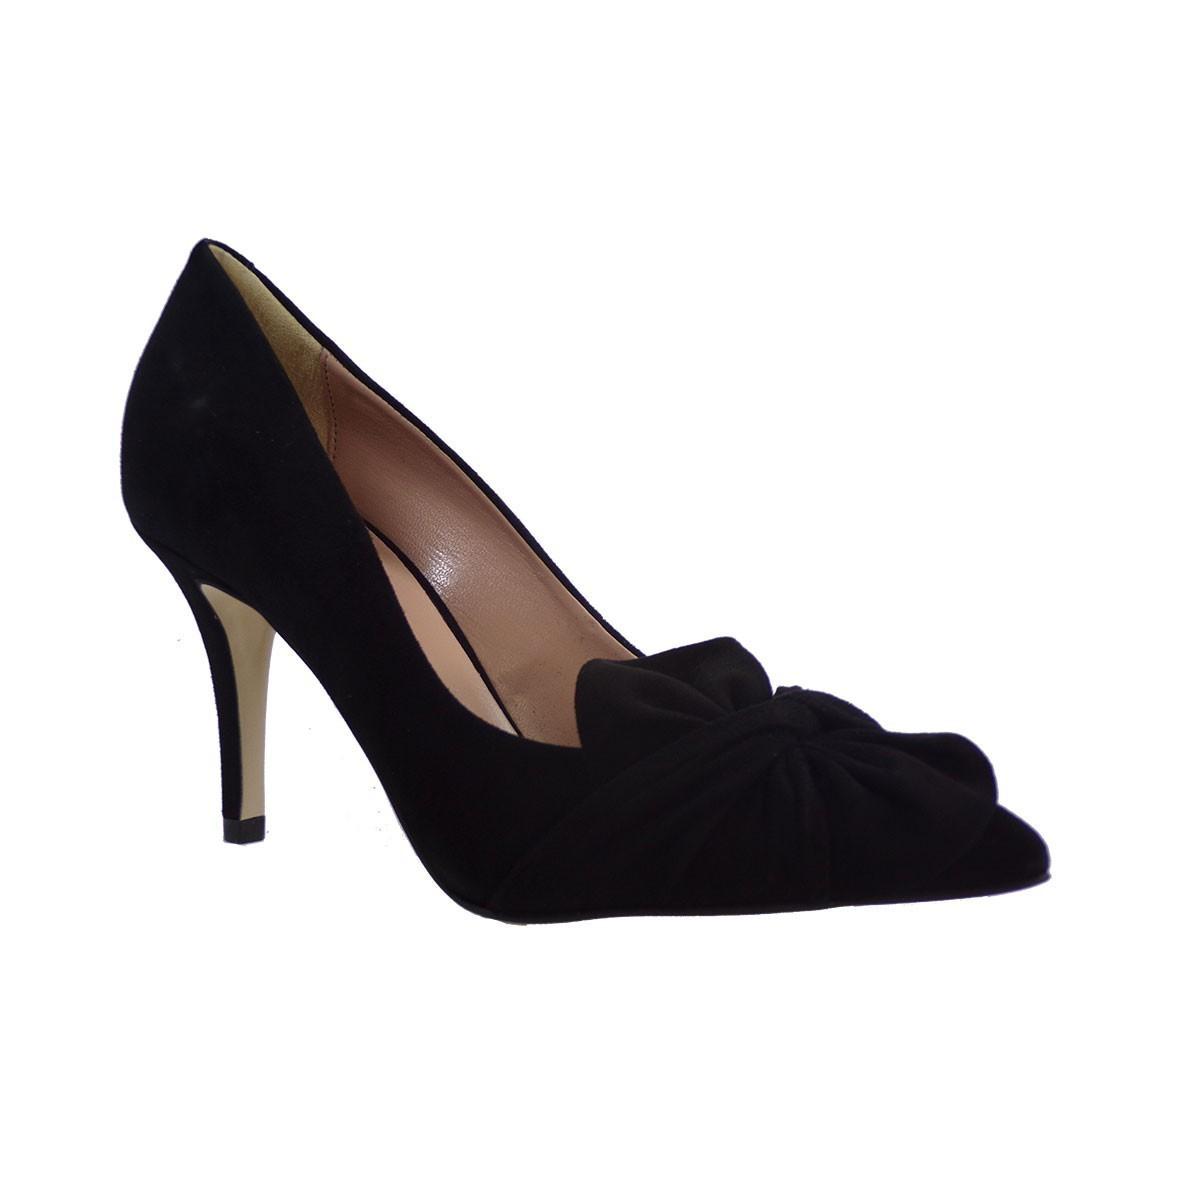 Fardoulis Shoes Γυναικείες Γόβες 22(2301) Μαύρο Kαστόρι